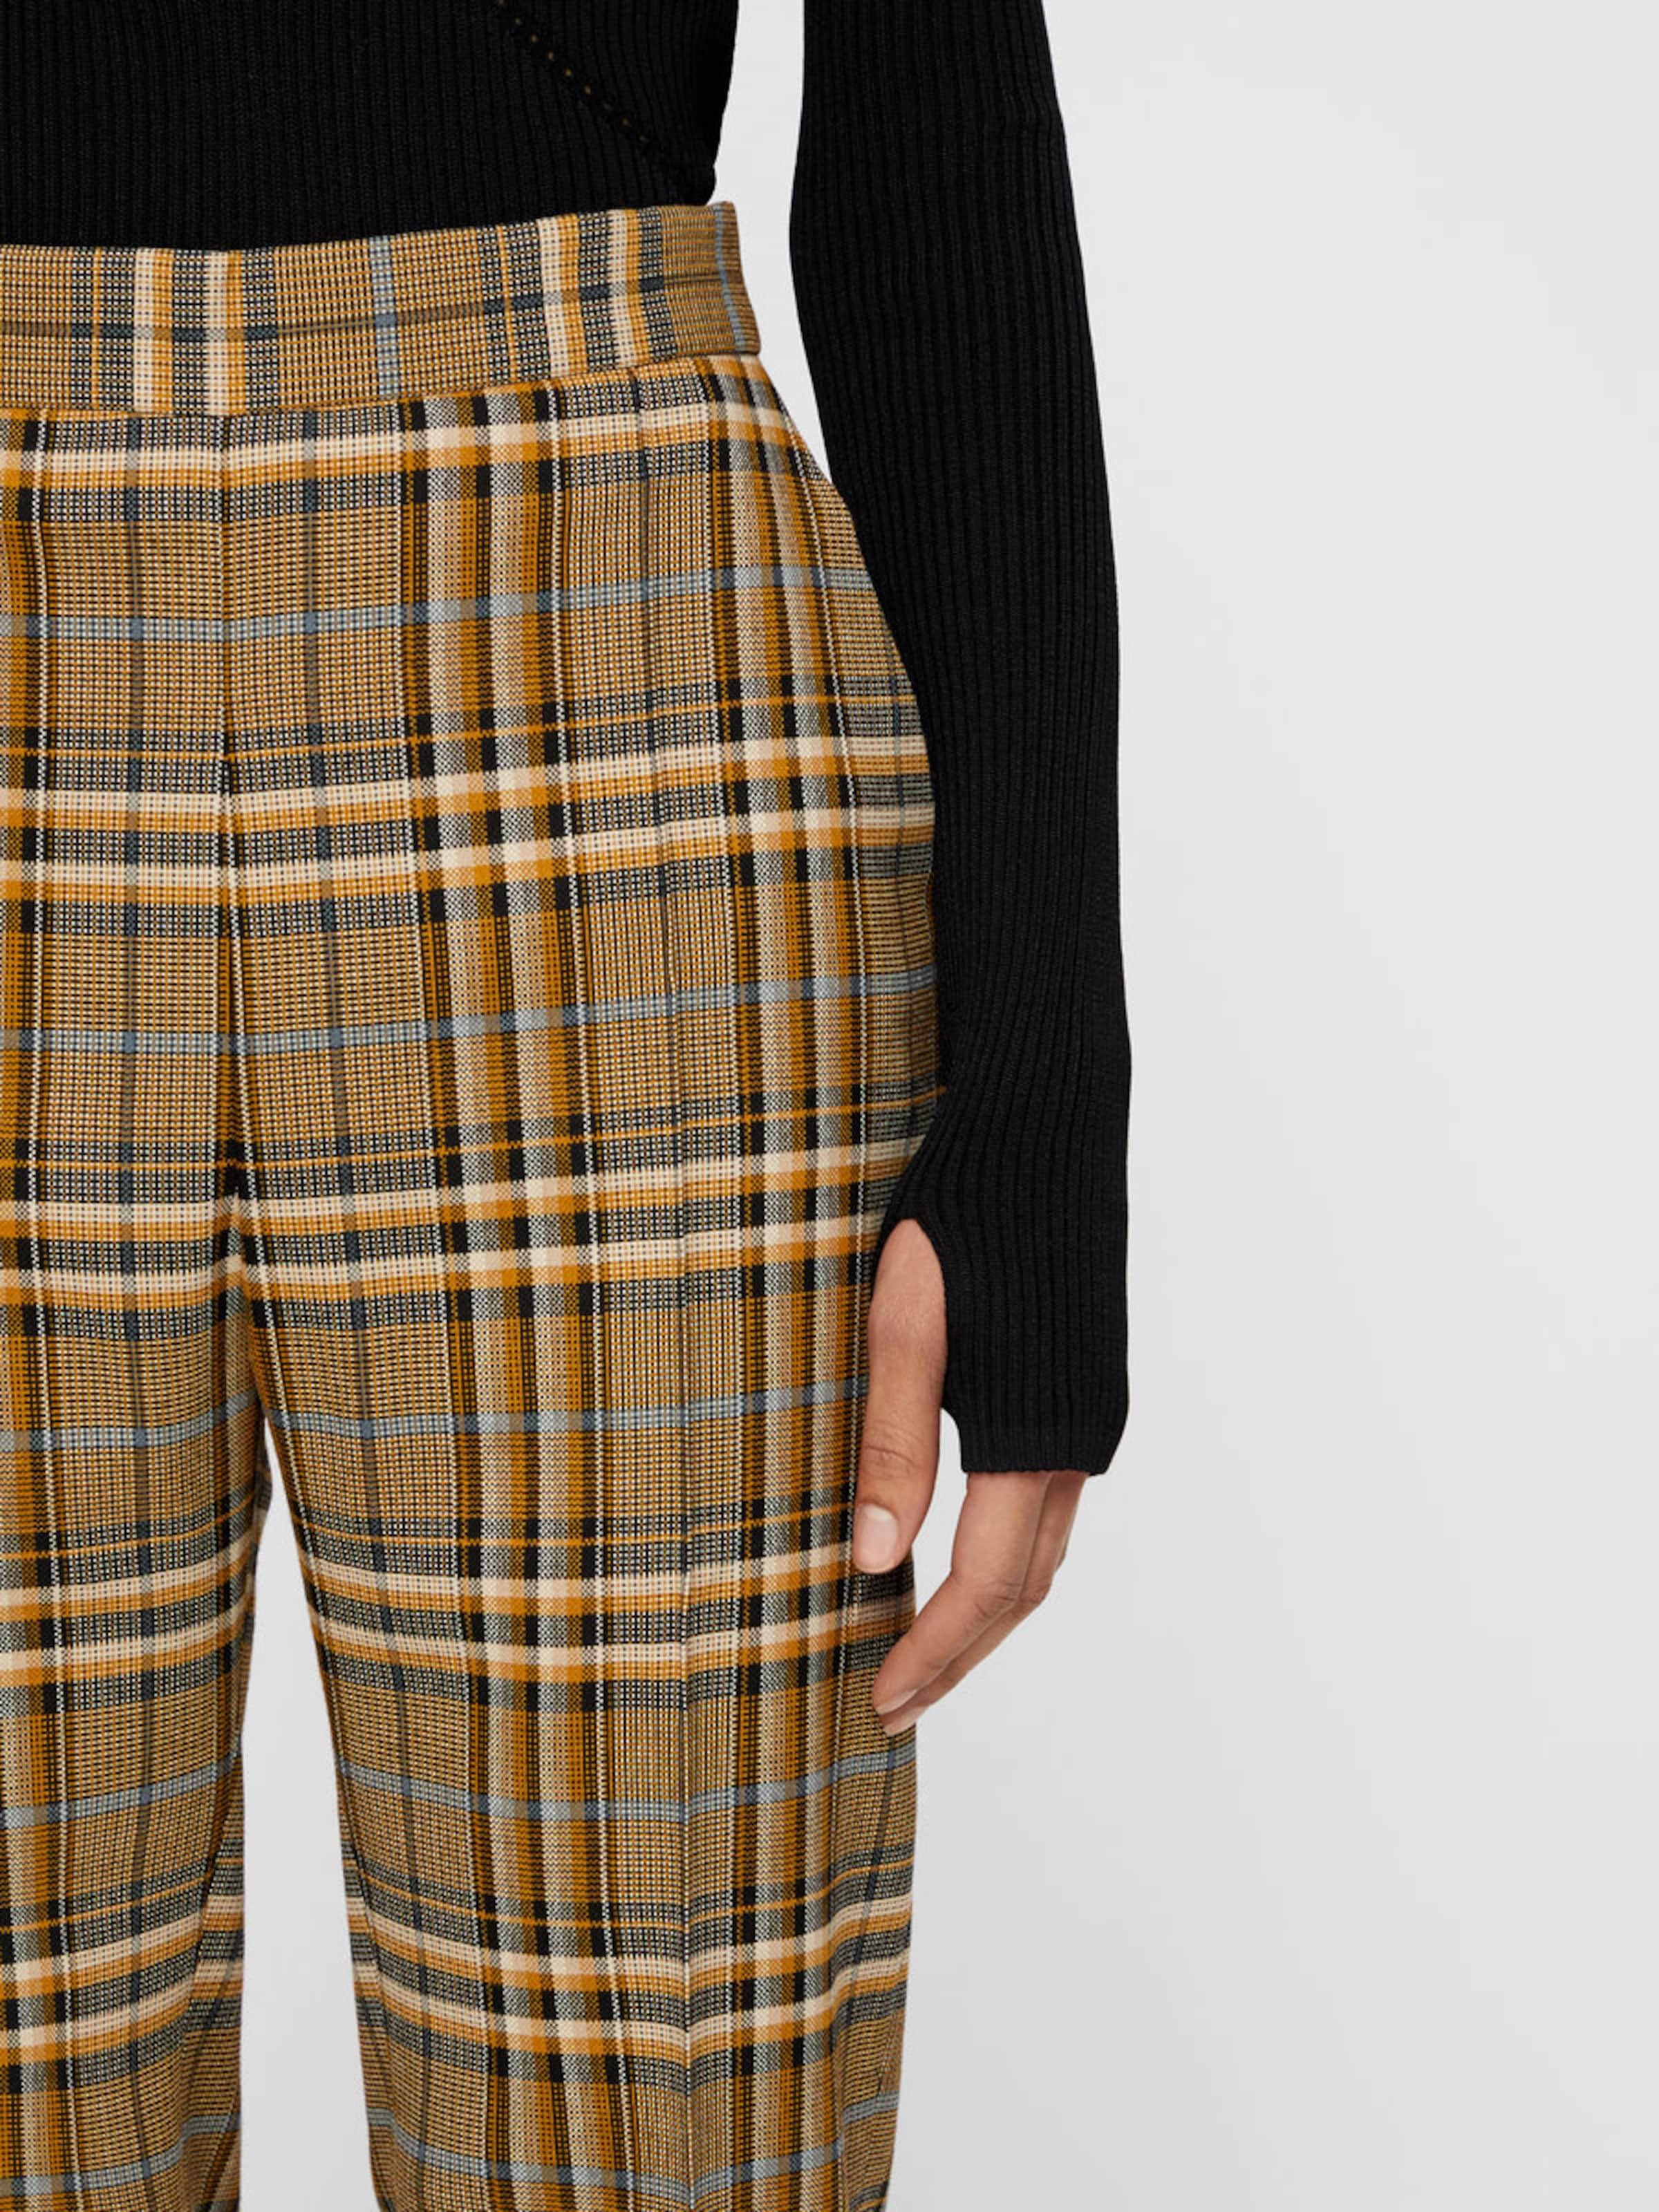 Check' lindeberg J 'mandalay Pantalon In KaramelCappuccino Soft j354ARqL